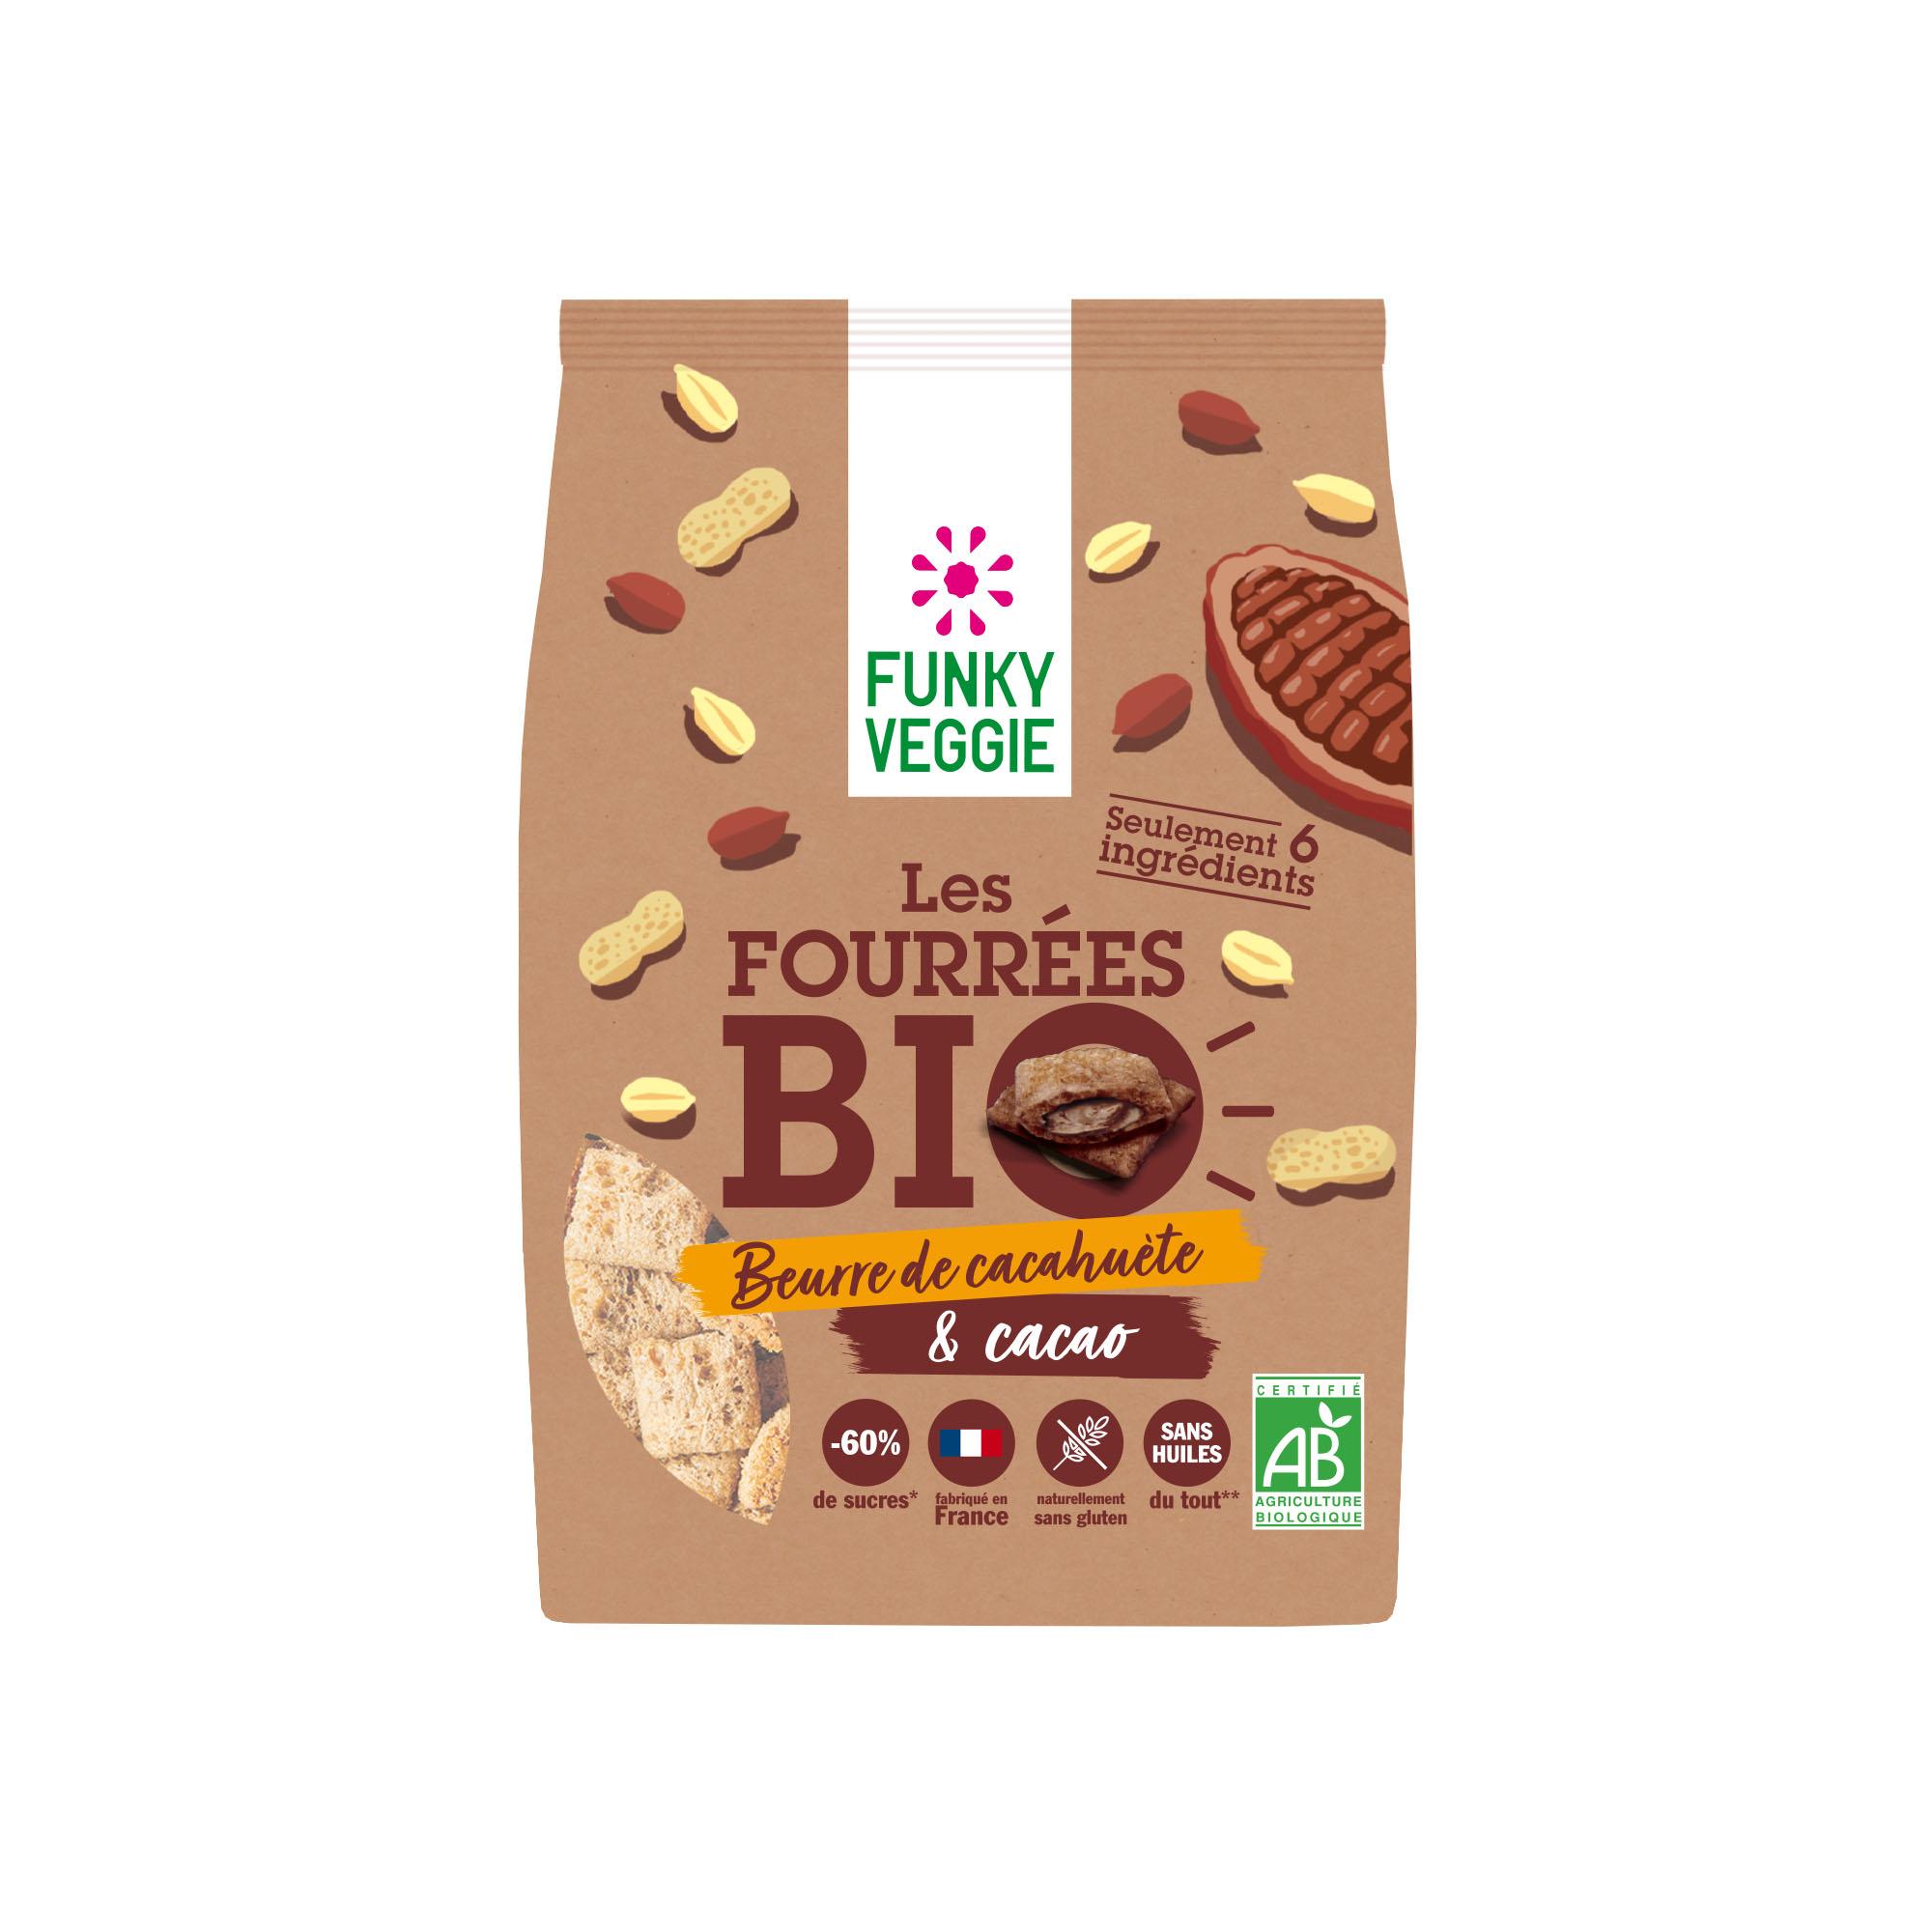 FUNKY VEGGIE  Fourrees Bio Cacao 495E - FUNKY VEGGIE se lance dans le petit-déjeuner